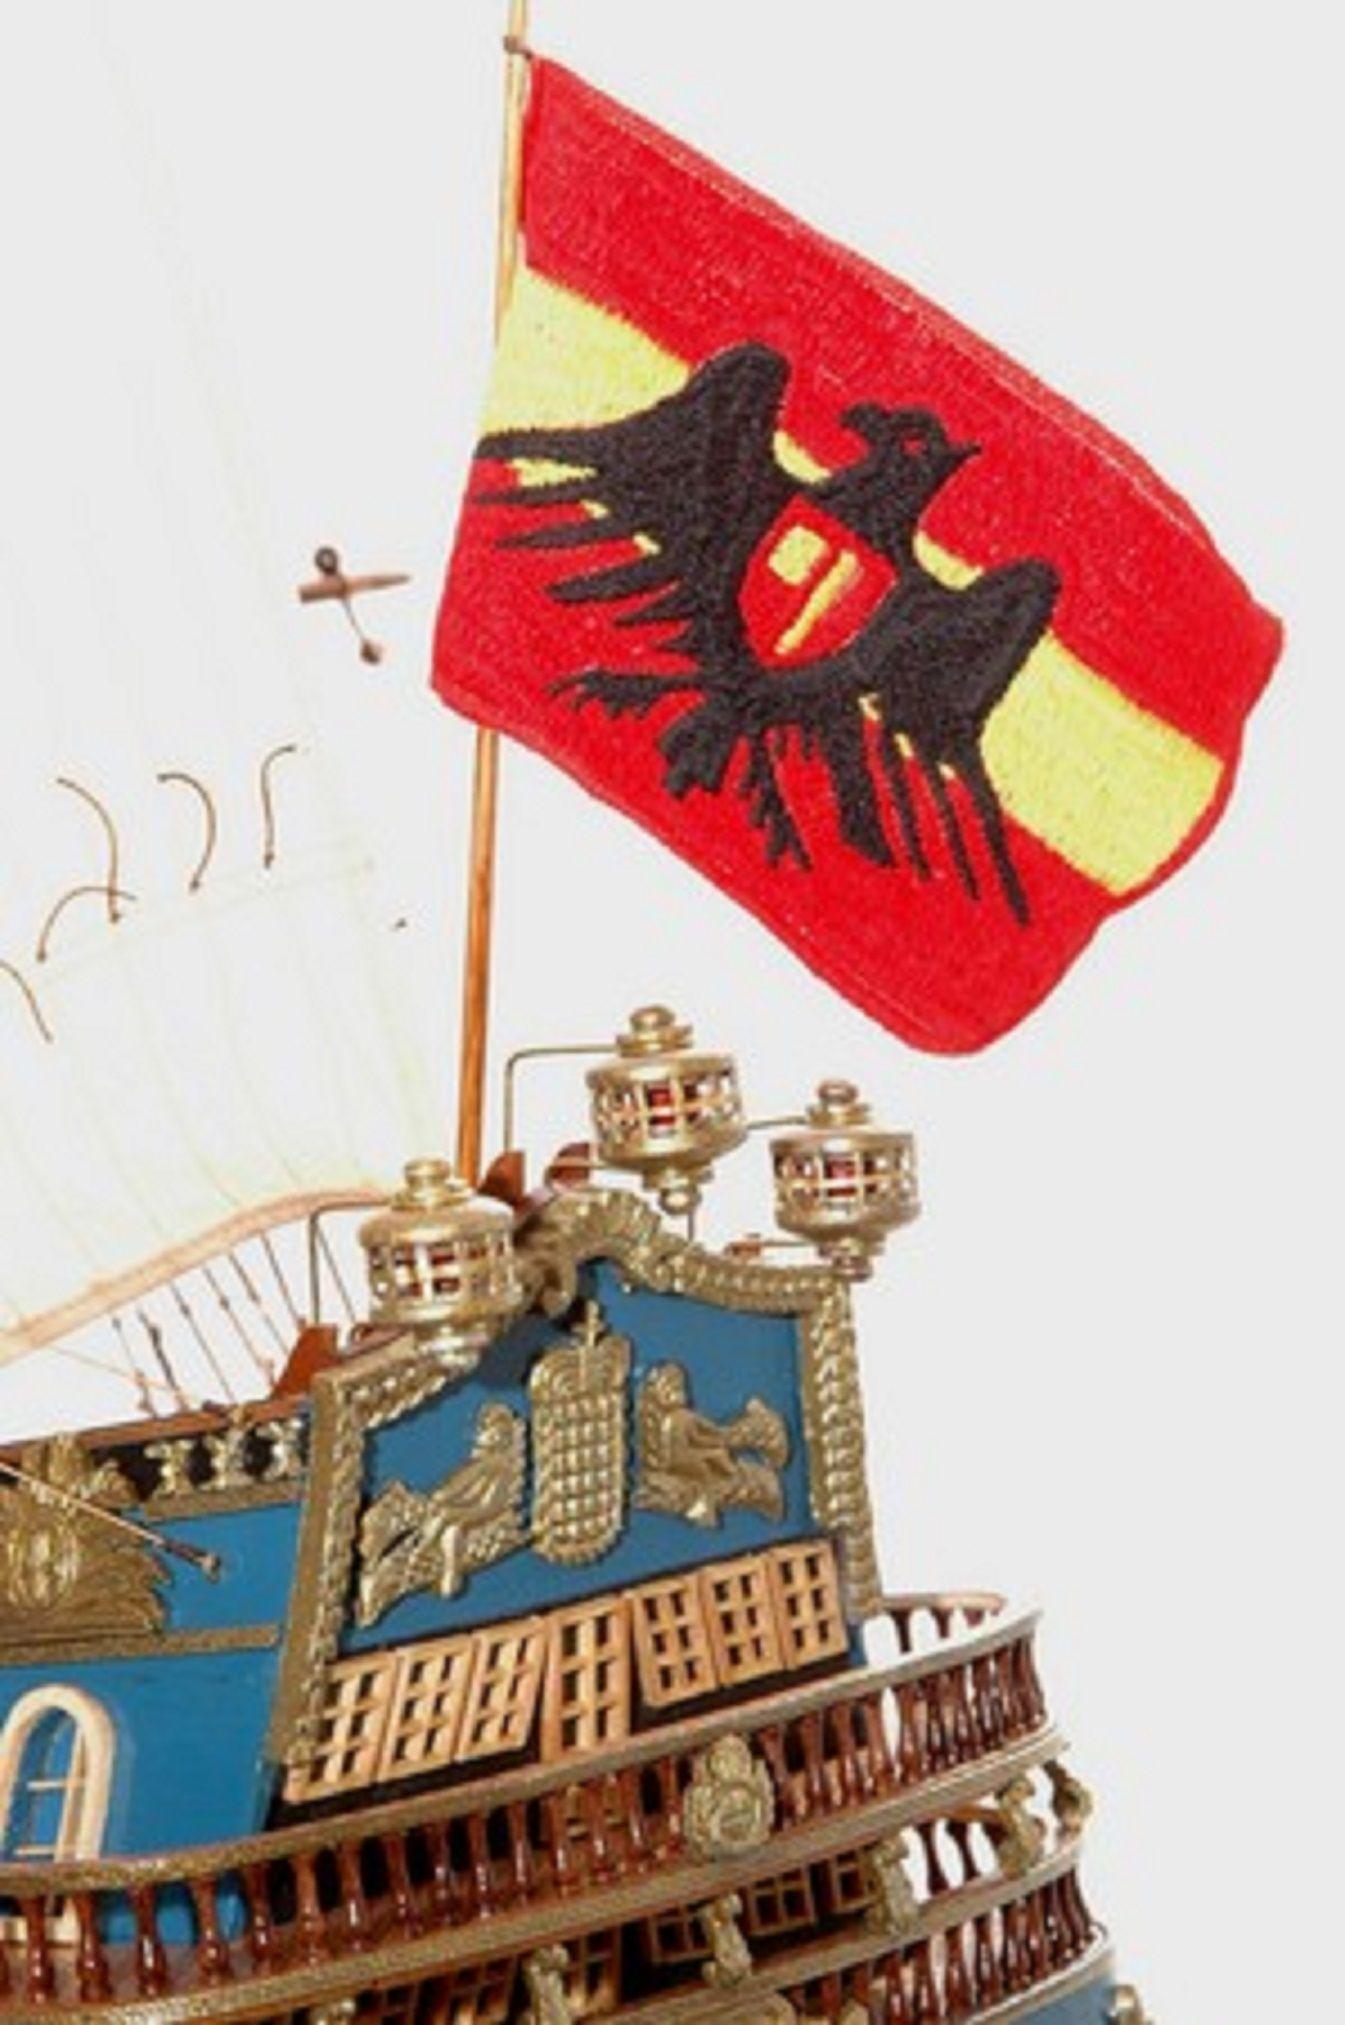 1418-7607-San-Felipe-model-ship-Extra-Large-Premier-Range